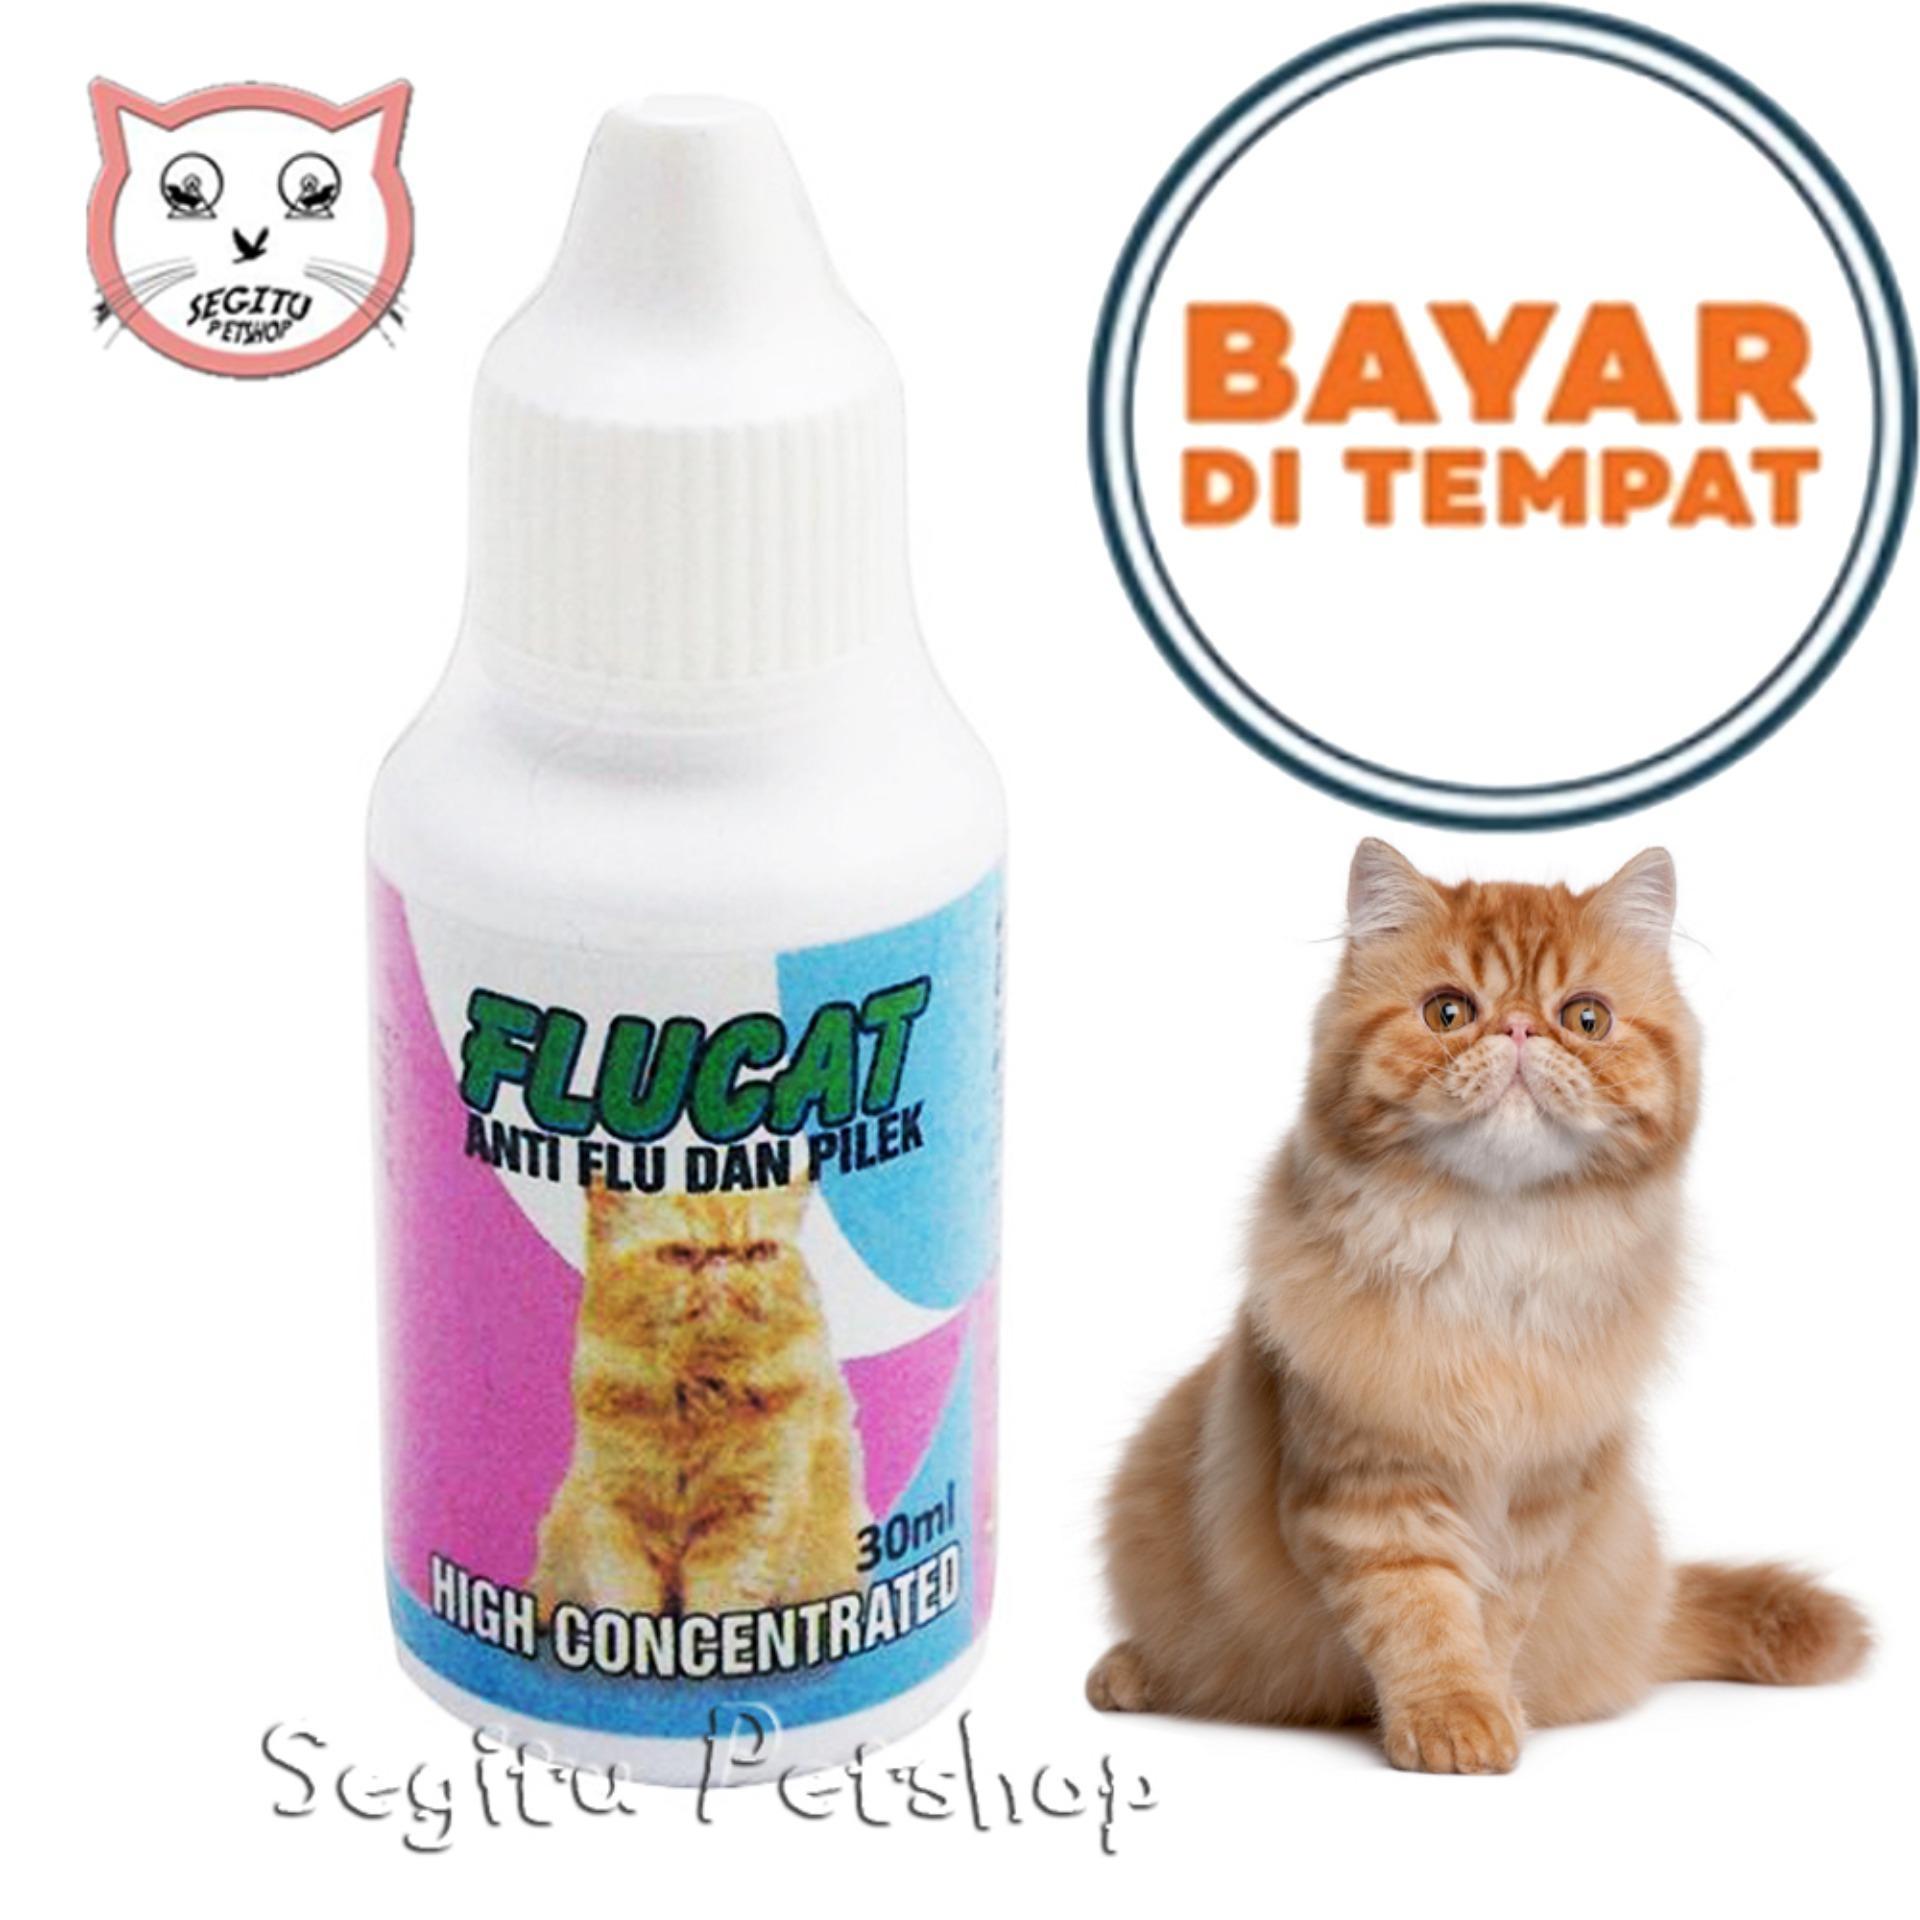 Obat Flu Dan Pilek Untuk Kucing Kitten Dan Dewasa - Flucat